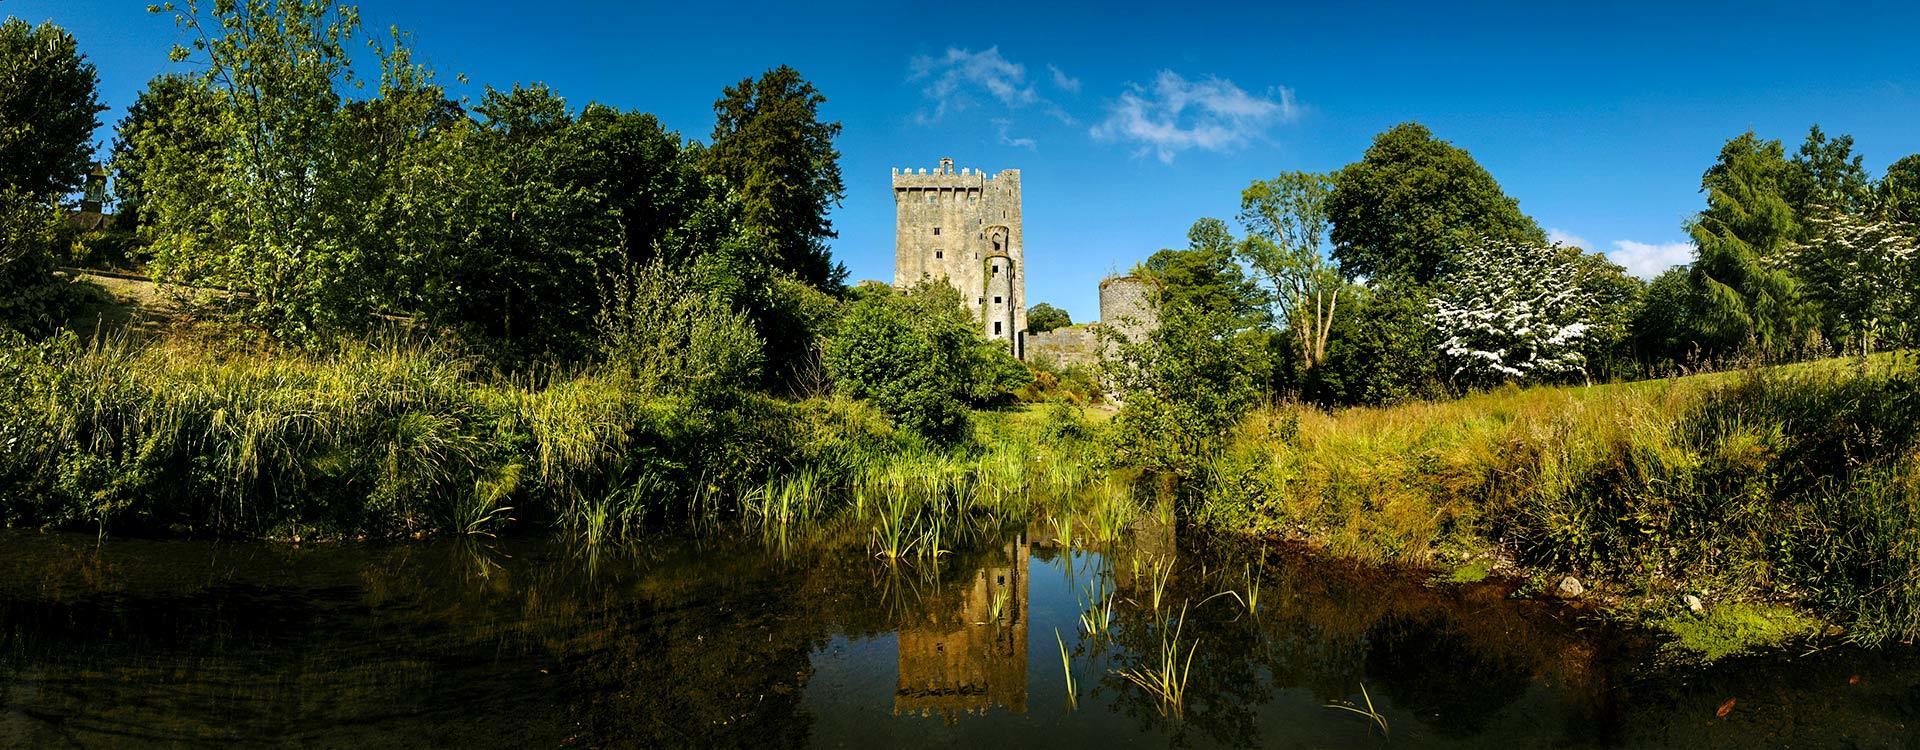 (Coach) Shore Tour from Cork: Blarney, Kinsale & Cork